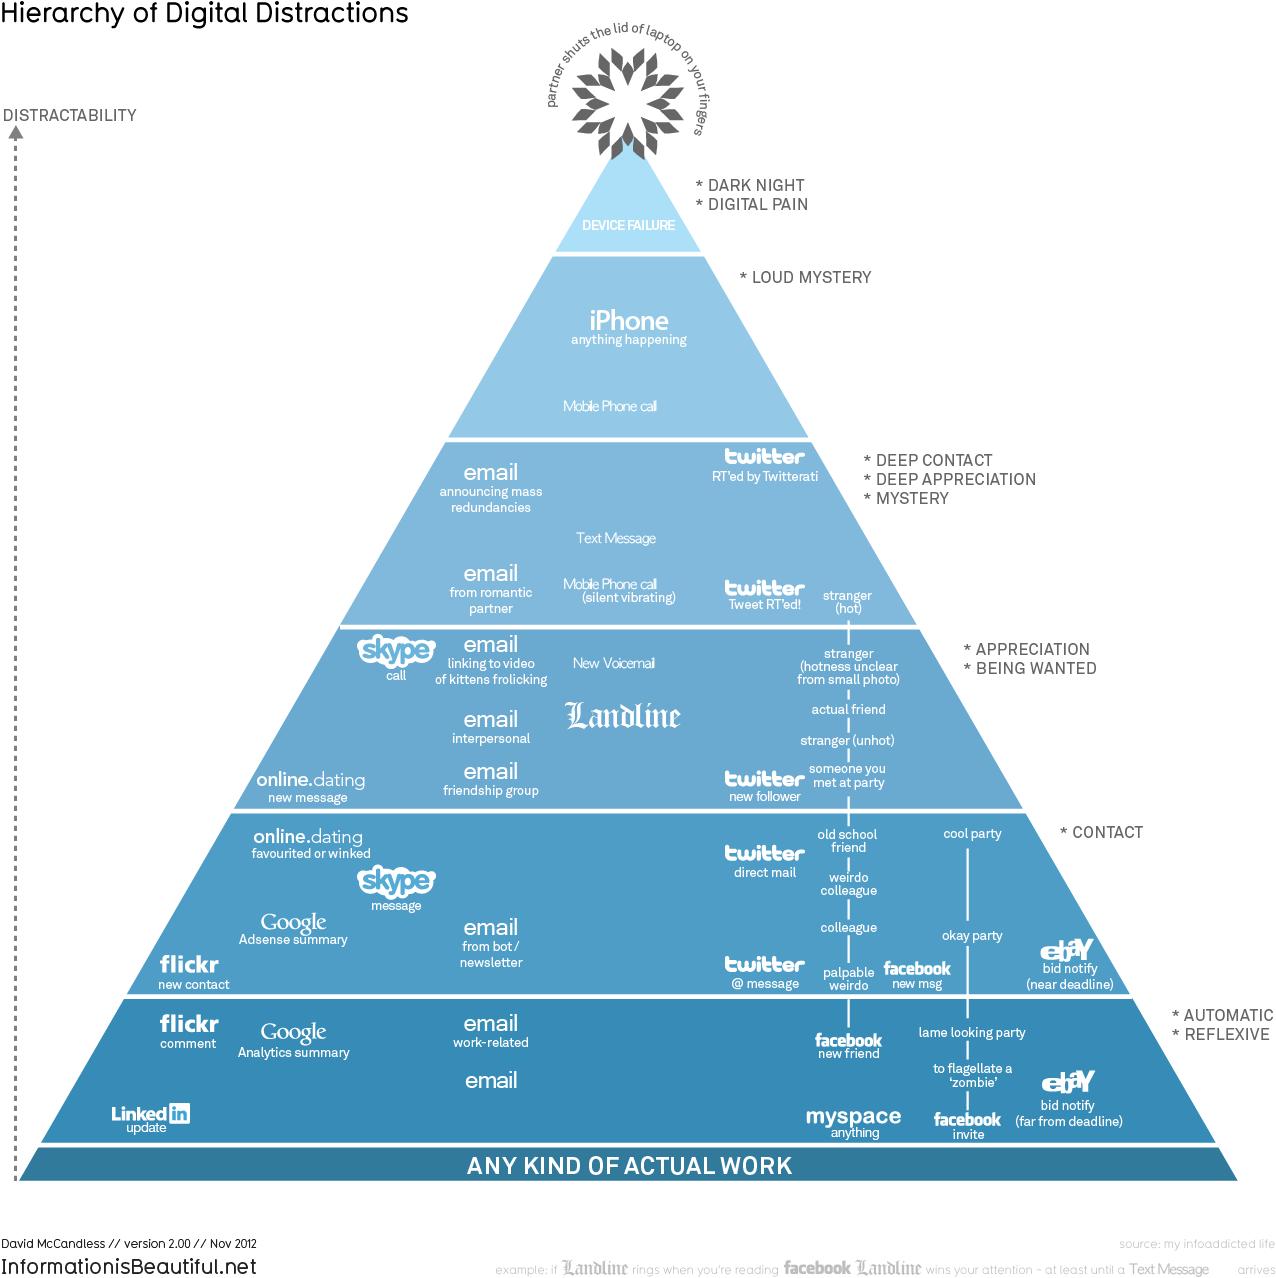 1276_hierarchy_of_digital_distractions